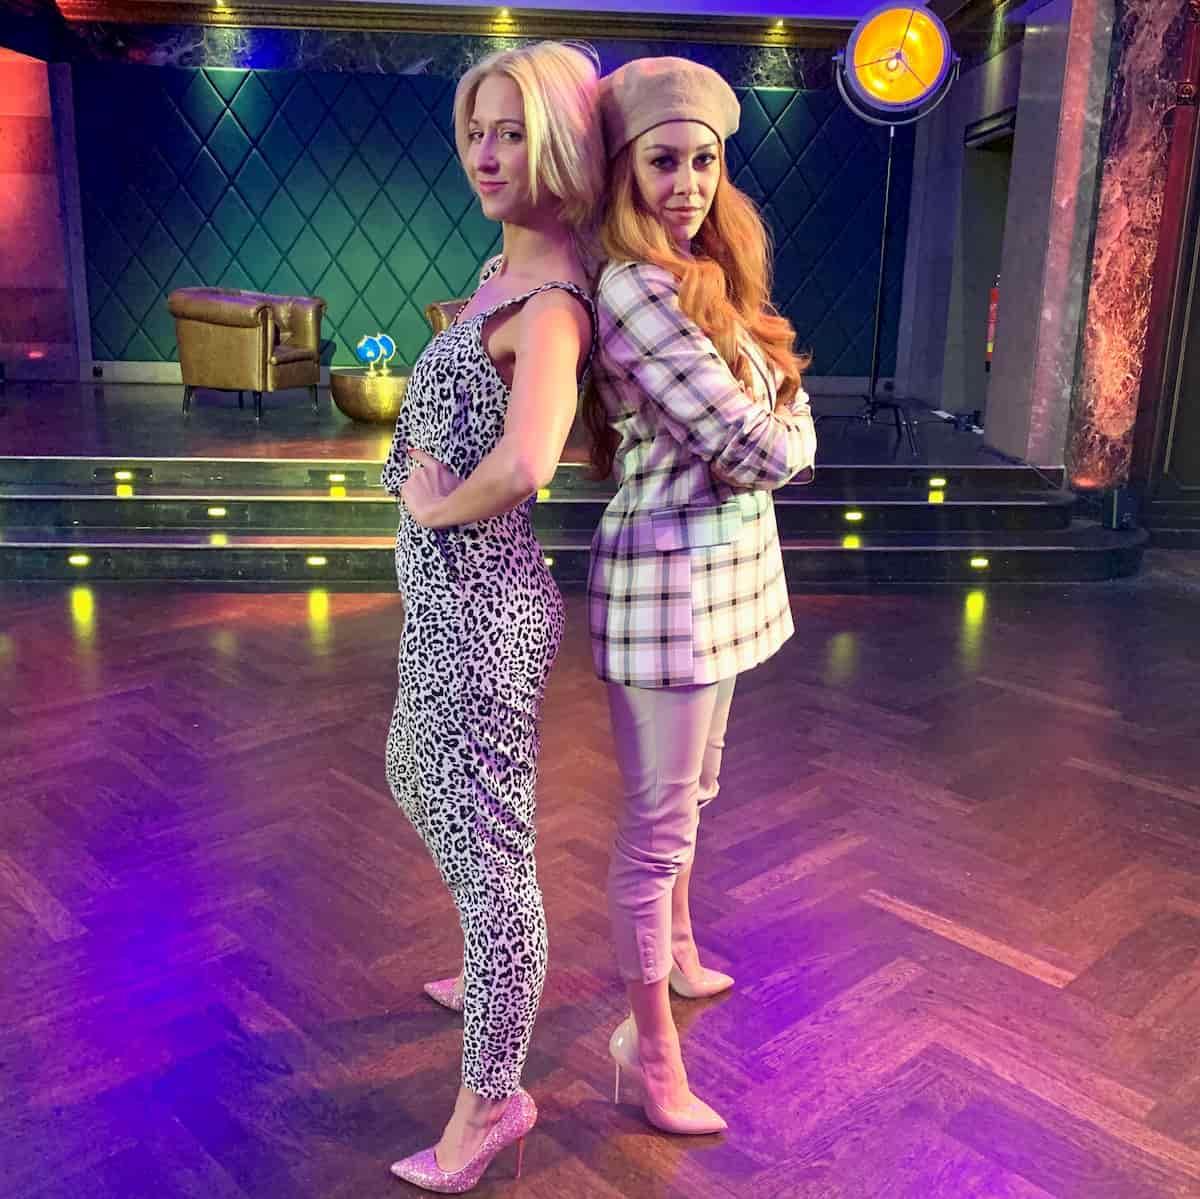 Kathrin Menzinger und Oana Nechiti - Llambis Tanz-Duell am 19.4.2020